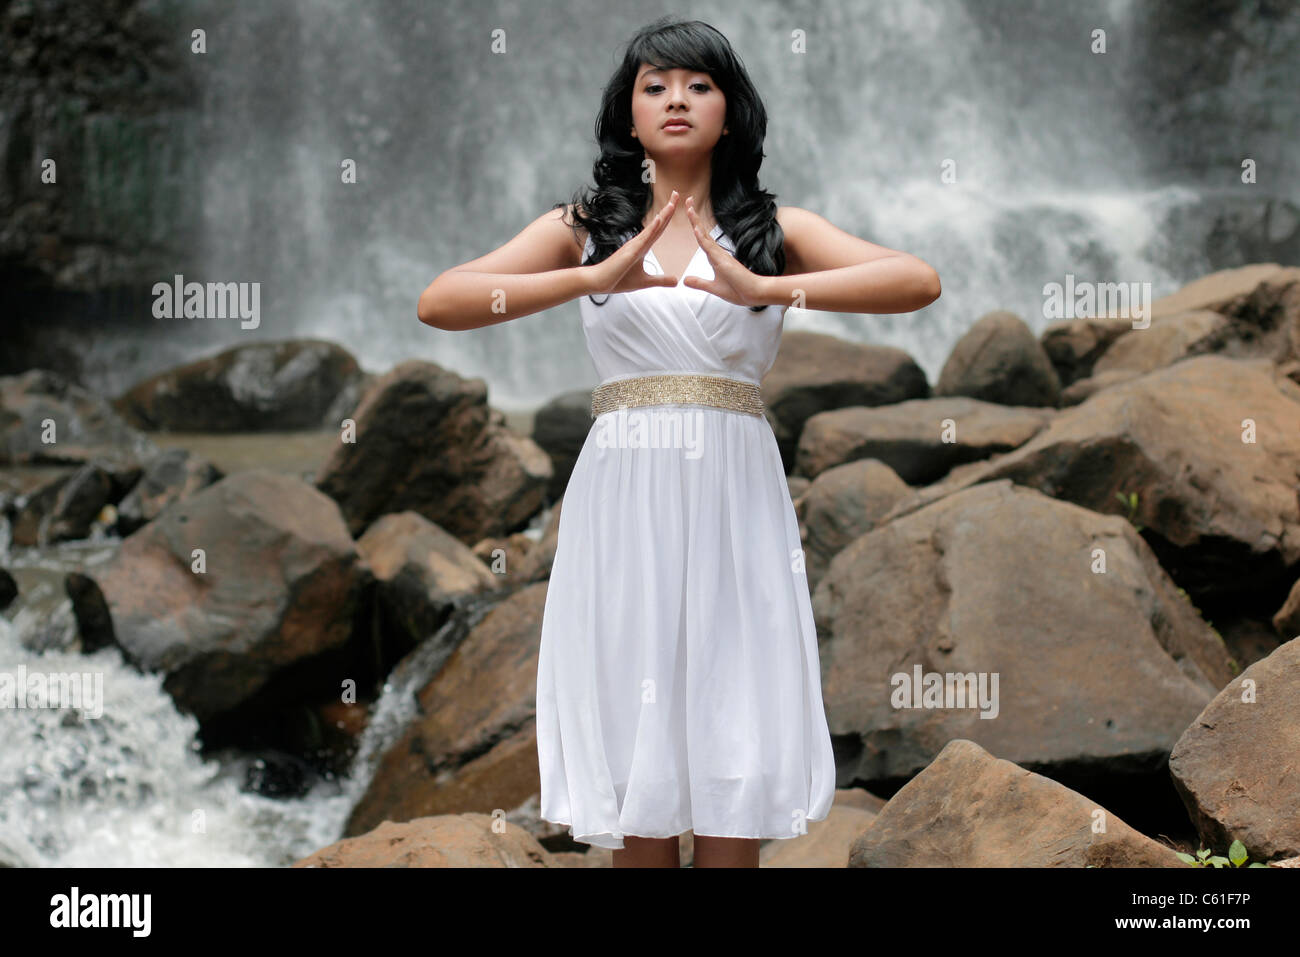 girl on waterfall landscape orientation - Stock Image